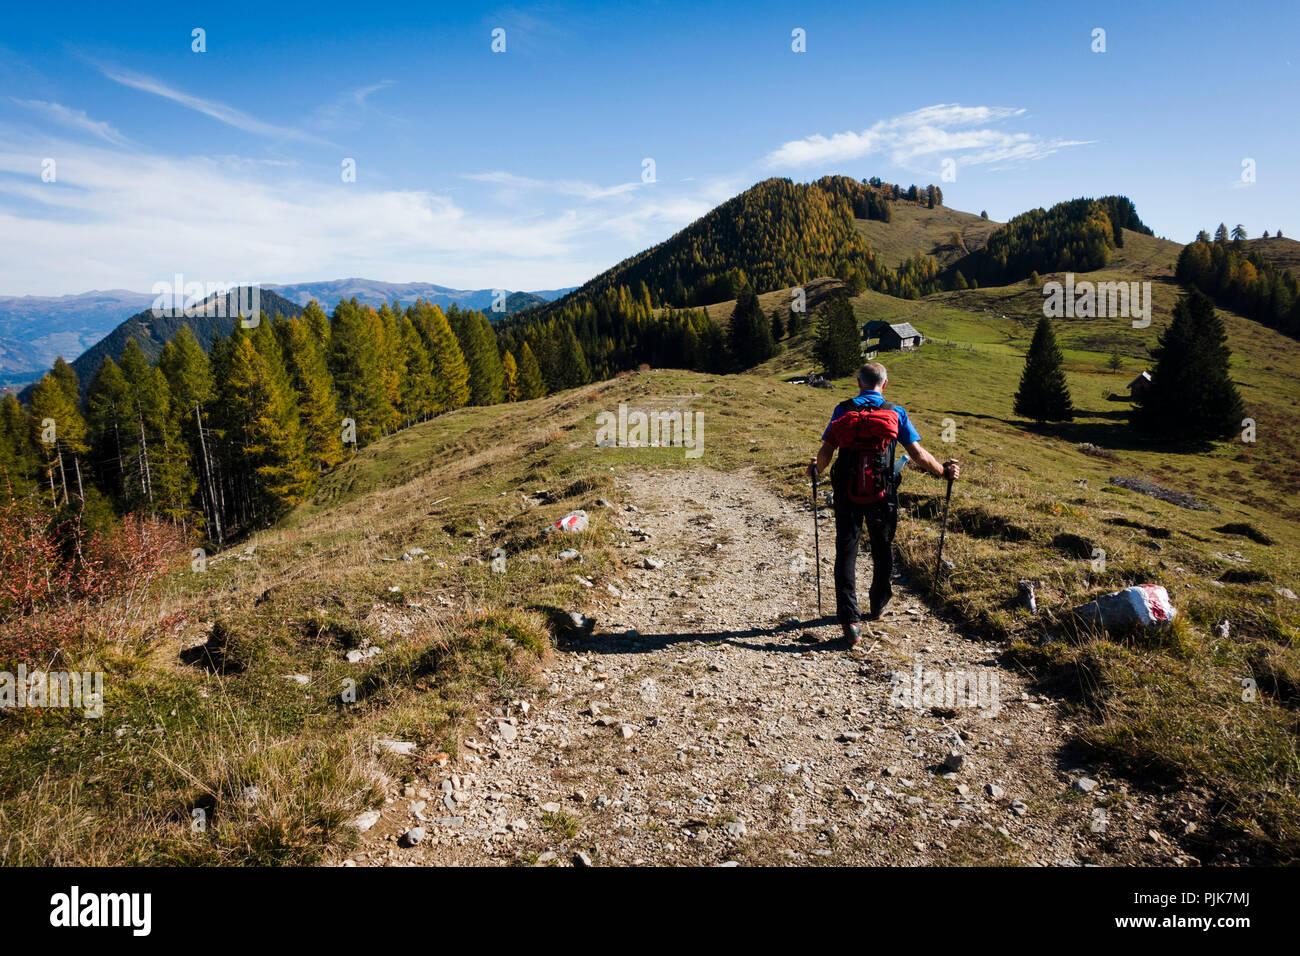 Hiking, Obermillstatt, Lake Millstatt, Carinthia, Austria - Stock Image